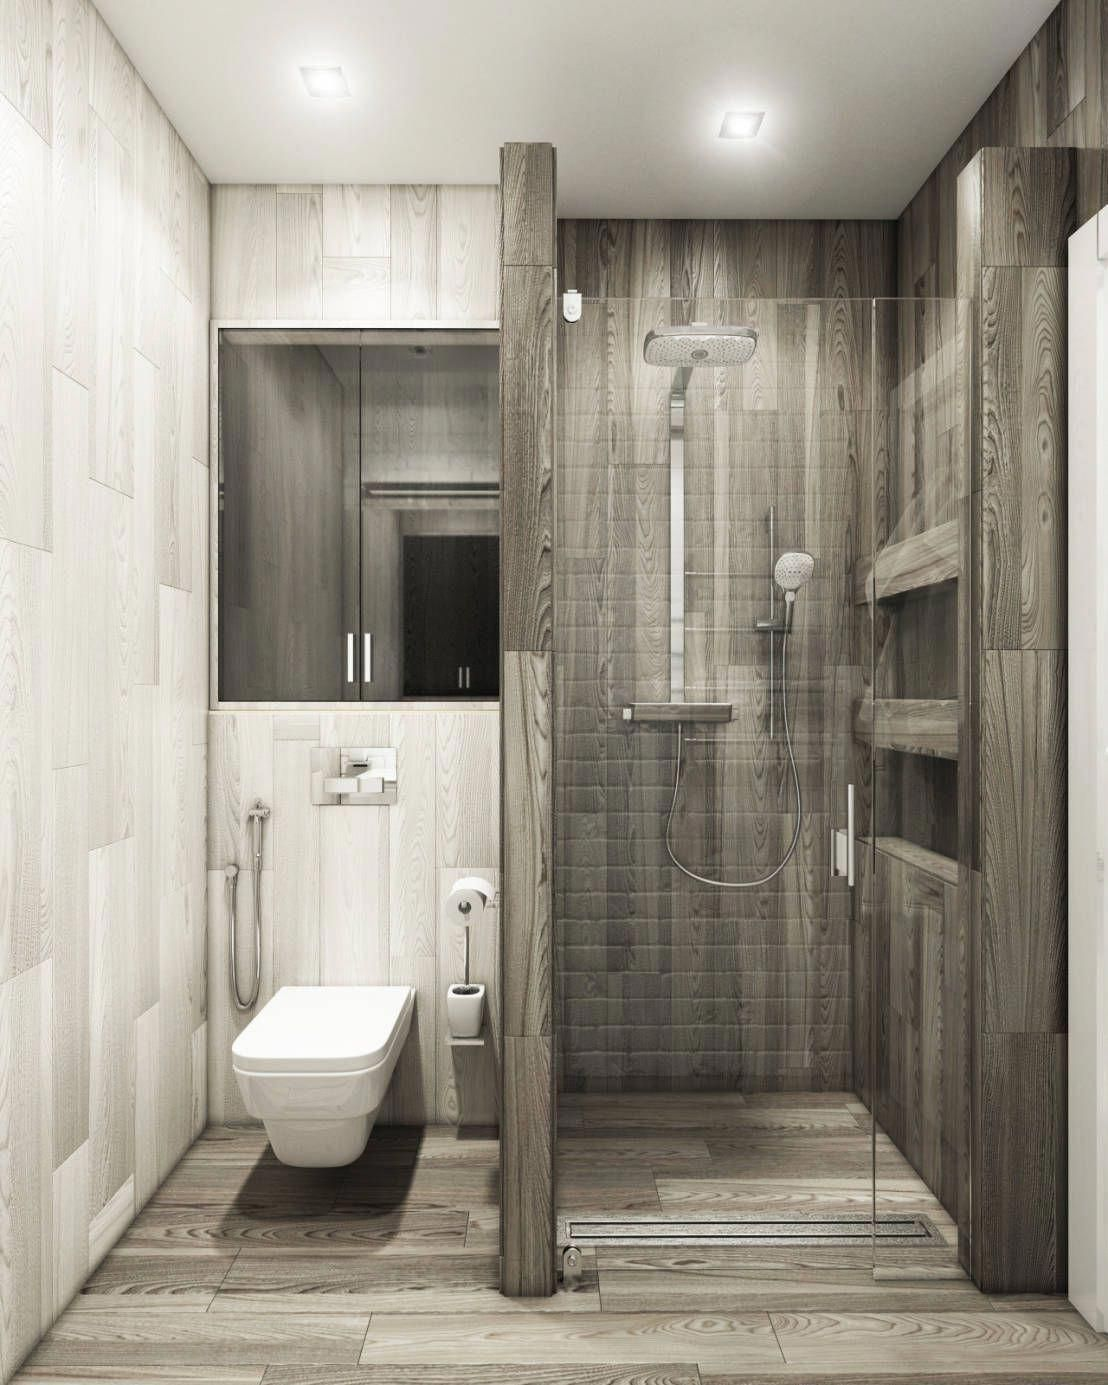 washroom renovation ideas bathroom remodel cost washroom on bathroom renovation ideas nz id=28432